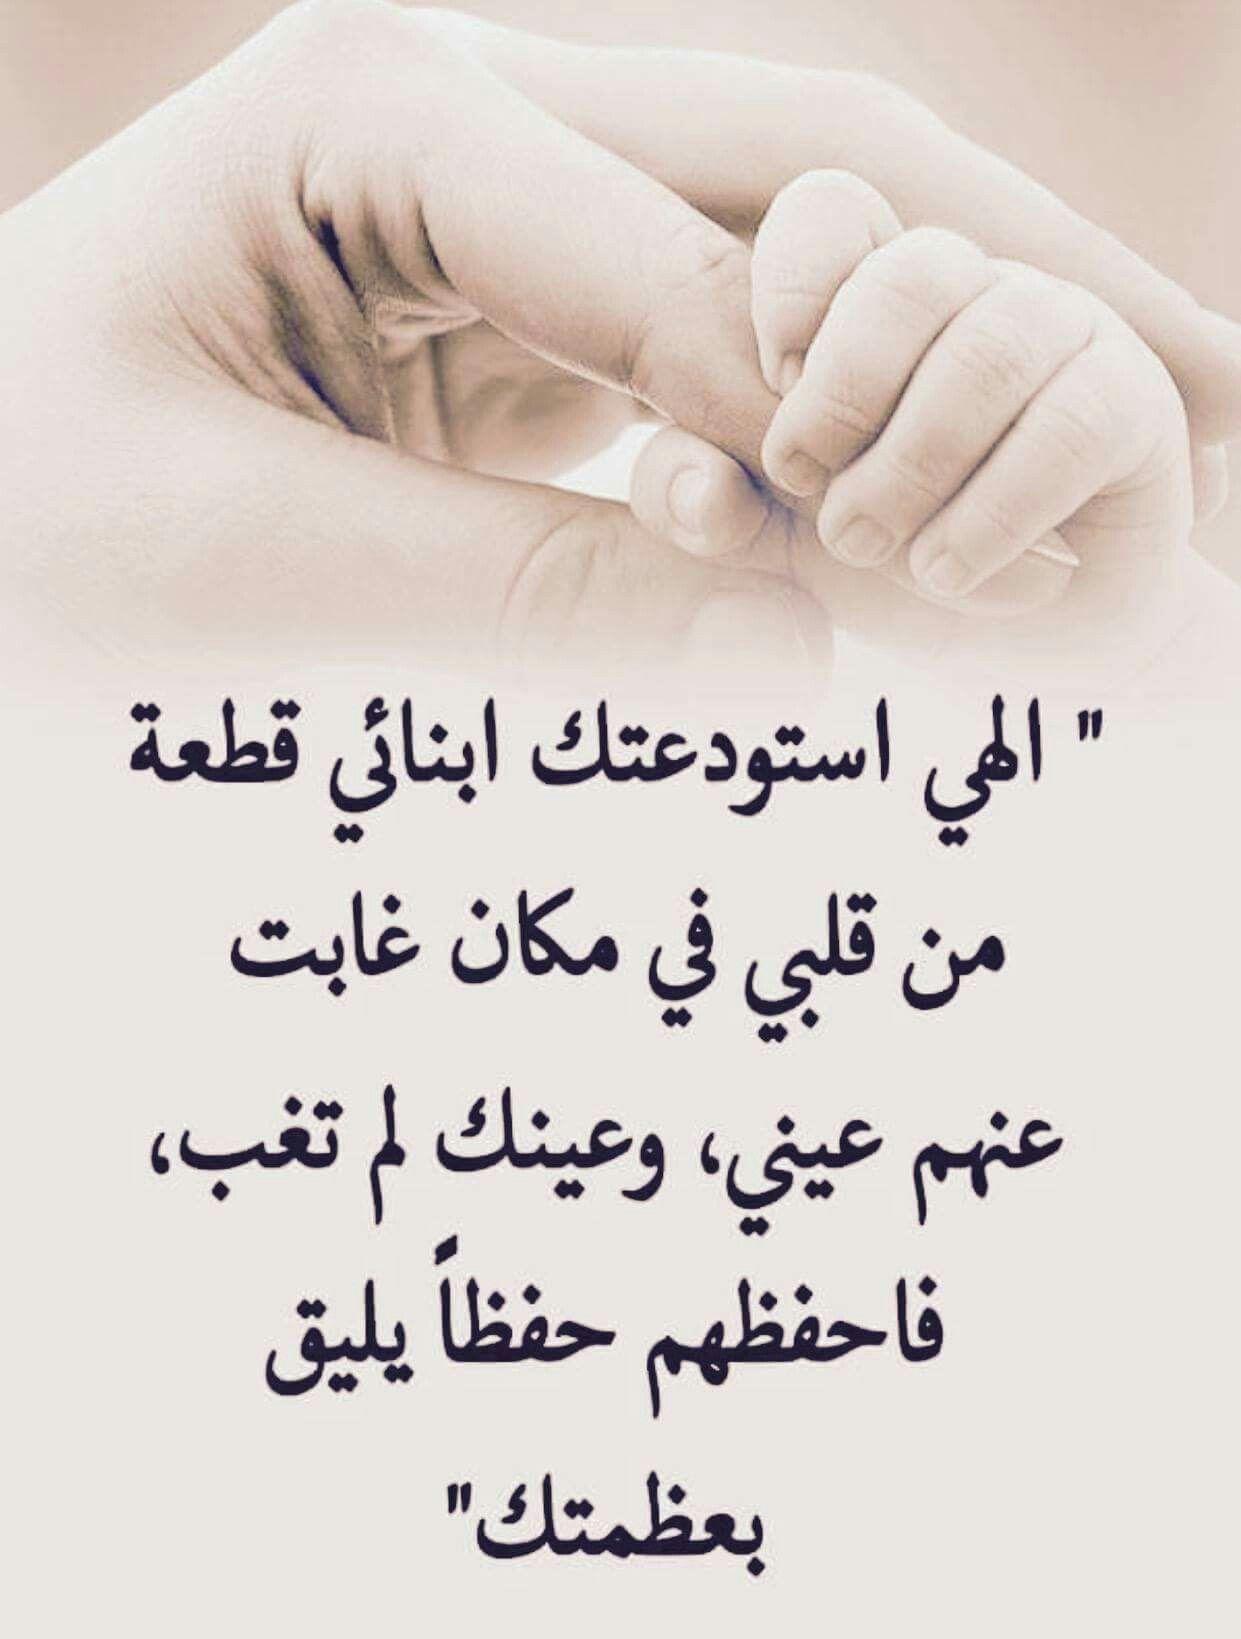 استودعهم عندك يارب Islamic Phrases Cool Words Islamic Quotes